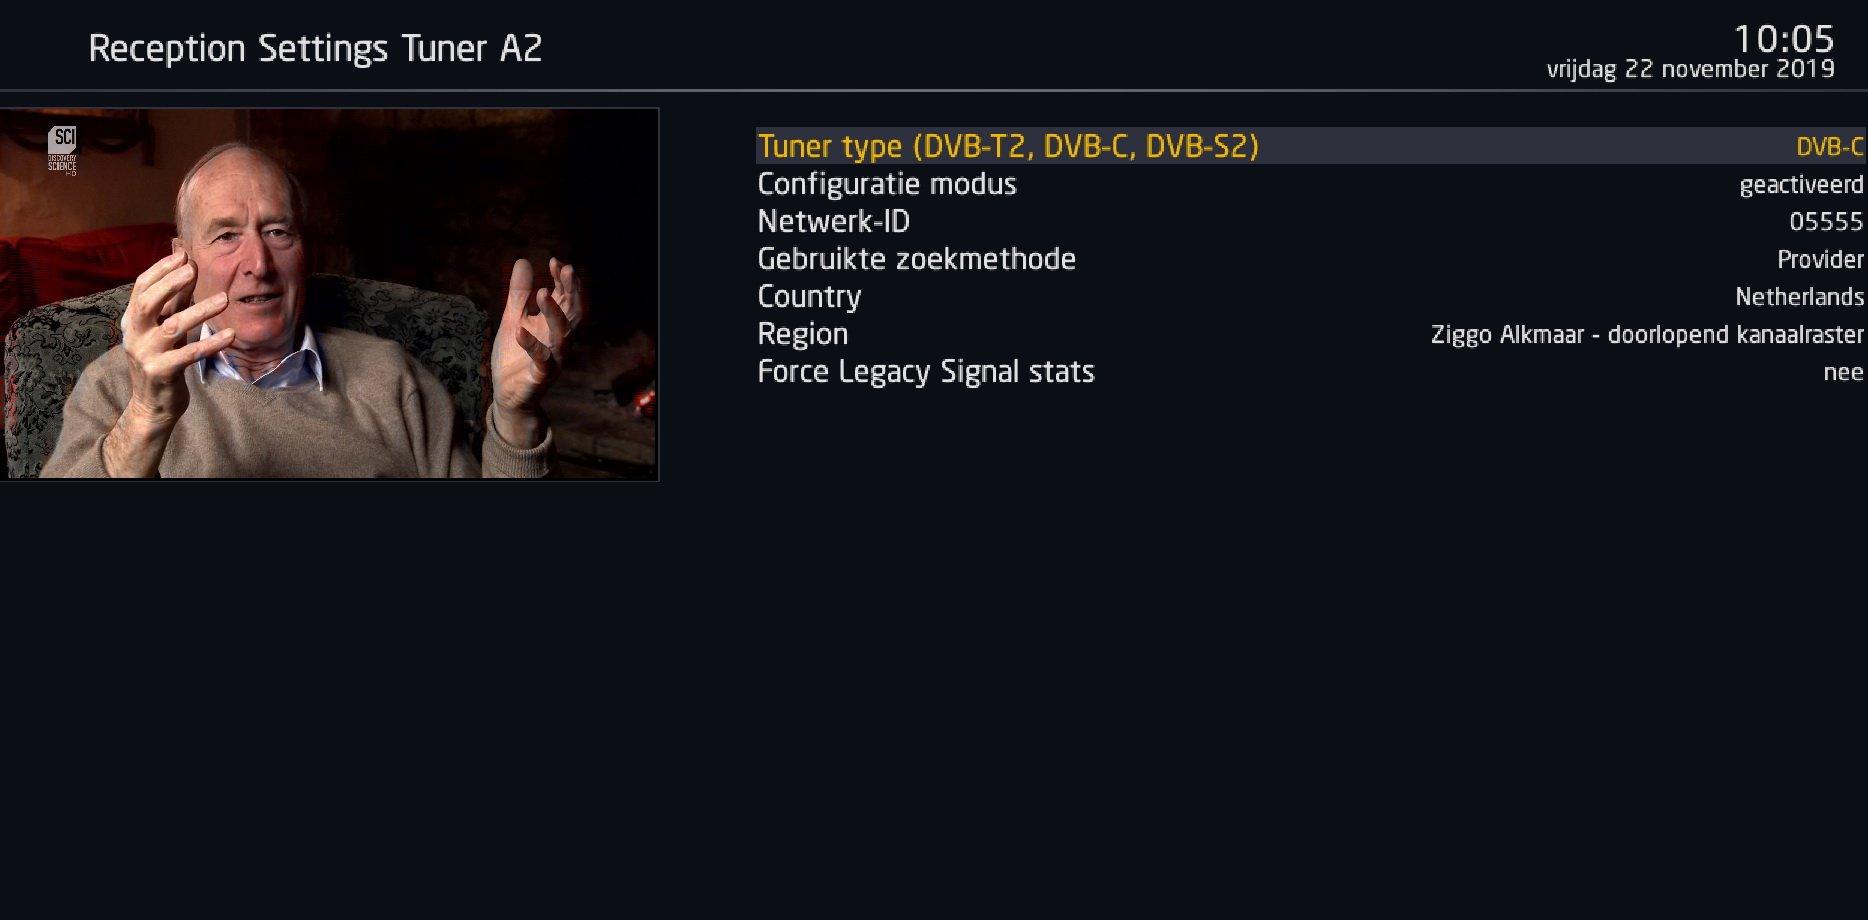 screenshot_2019-11-22_10-05-15.jpg.4bd356b19c642b07a1e62f7fa8fa58a0.jpg